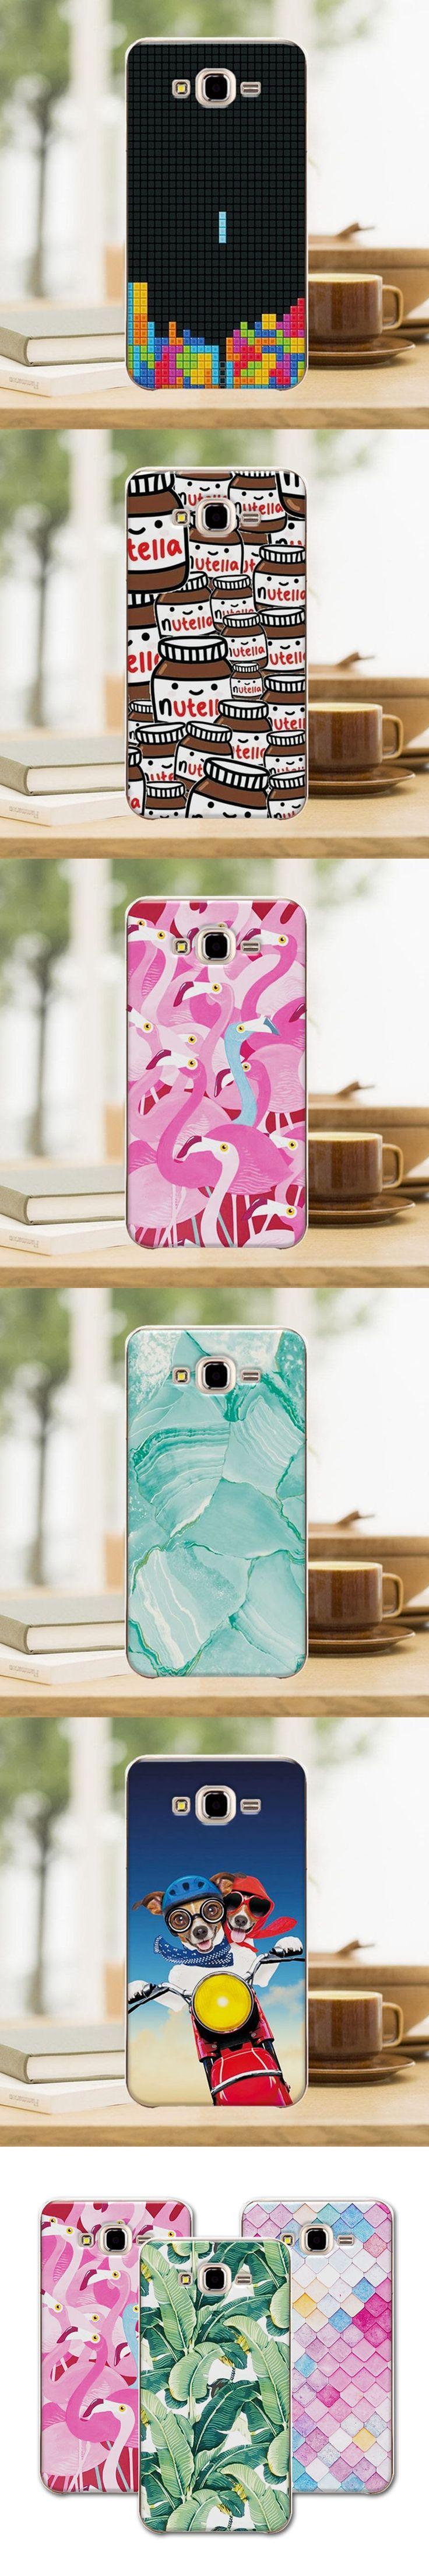 "Mermaid Newest Flamingo Cute Phone Case For Samsung Galaxy J3 2016 J320 J320F J320H Case Cover For Samsung J3 2016 5""+Free Gift"